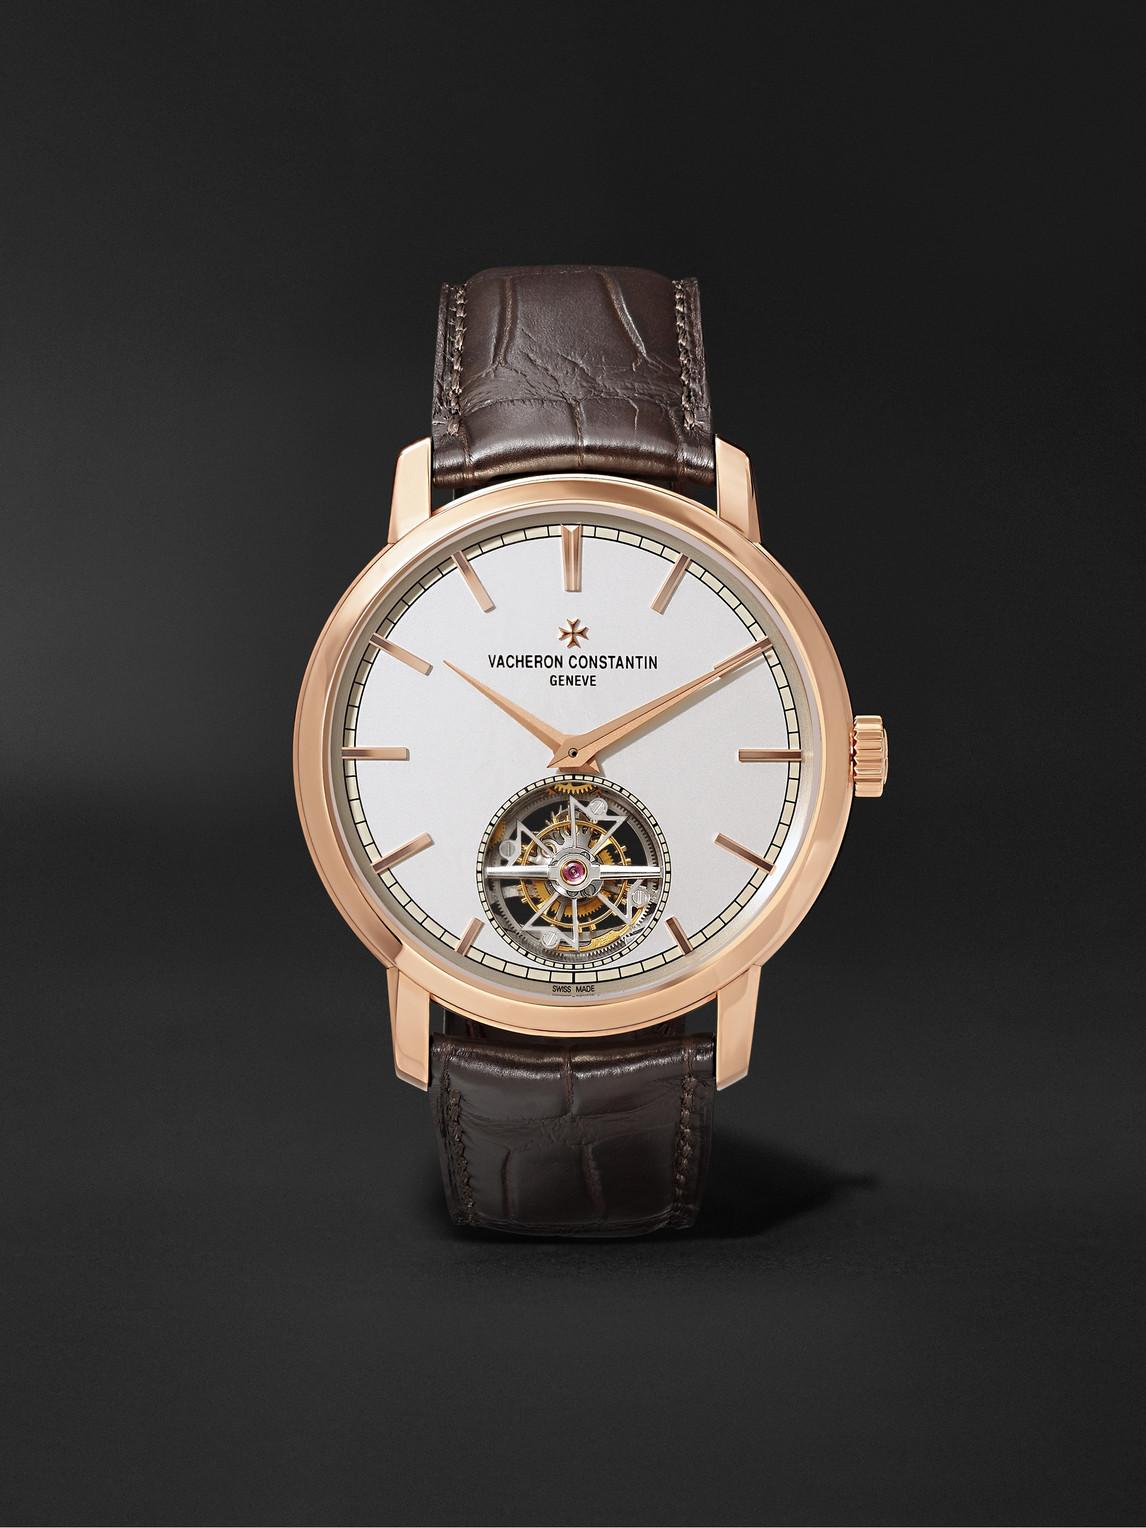 Vacheron Constantin Traditionnelle Tourbillon Automatic 41mm 18-karat Pink Gold And Alligator Watch, Ref. No. 6000t/000r In Brown